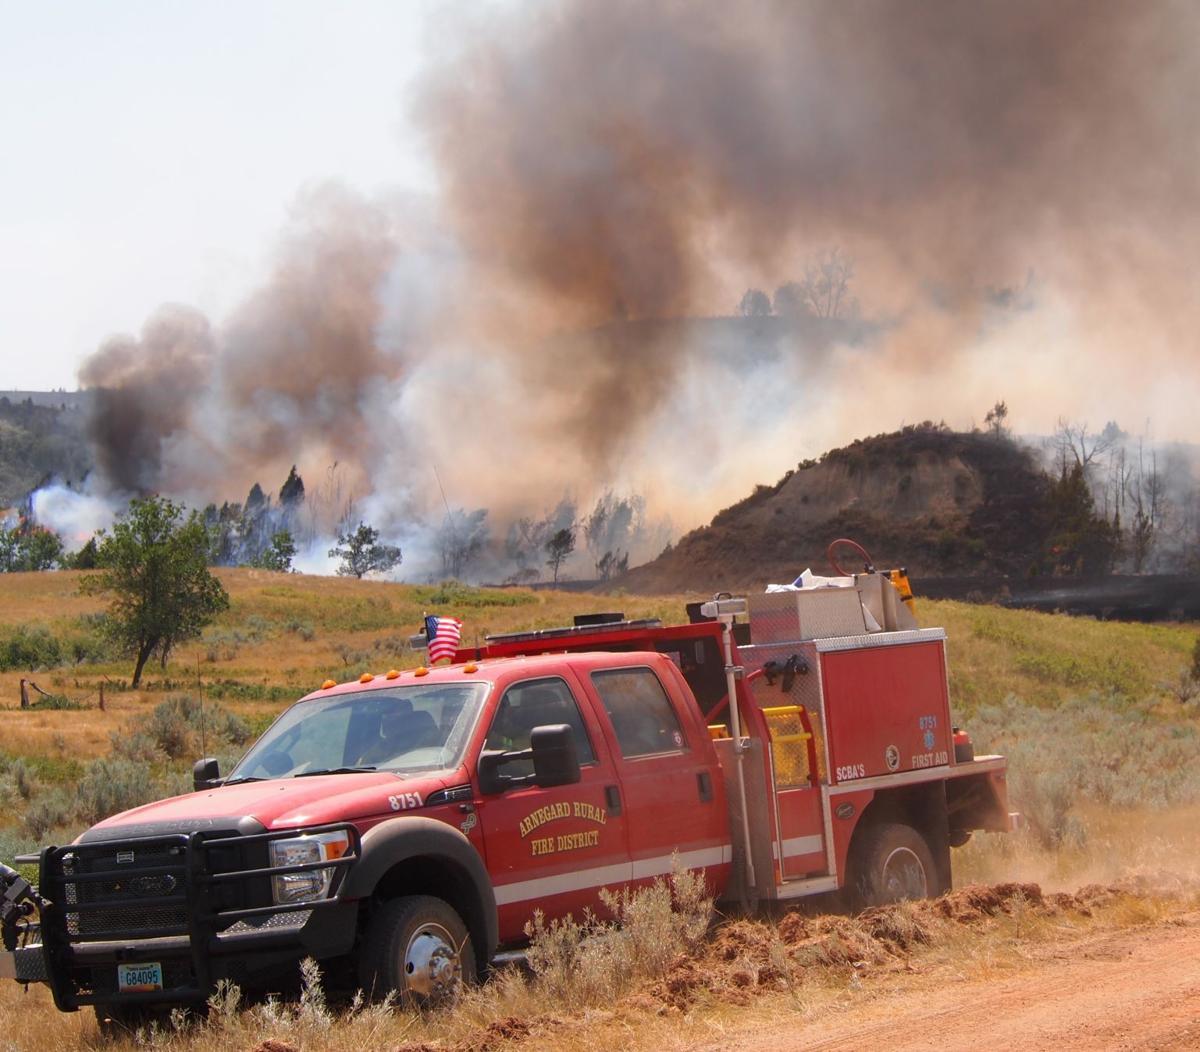 Fighting fire in Grassy Butte